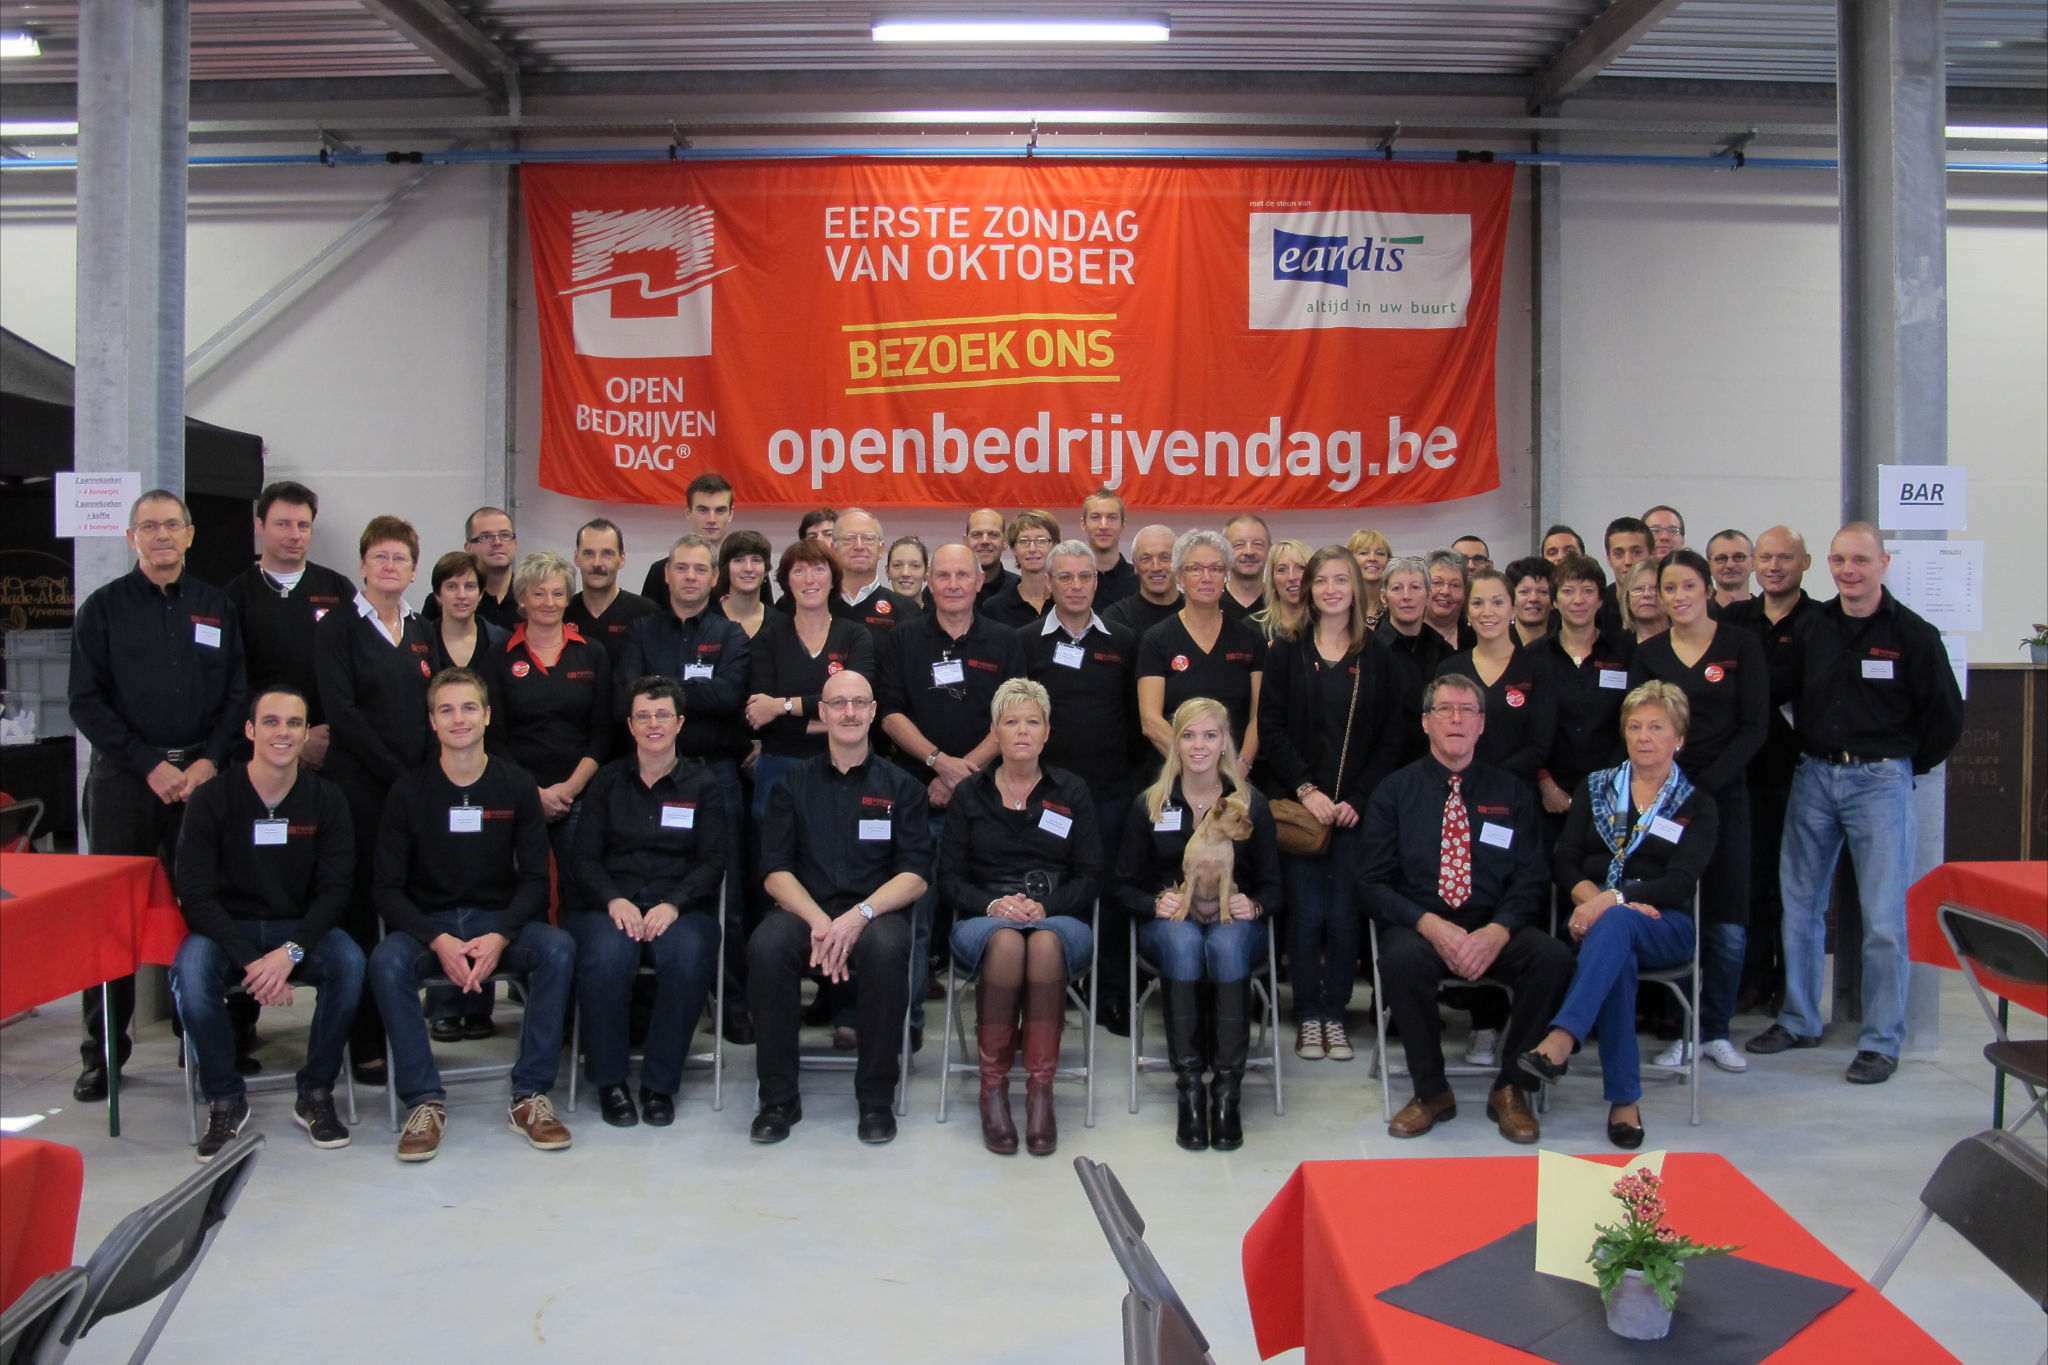 Open Bedrijvendag 7 oktober 2012